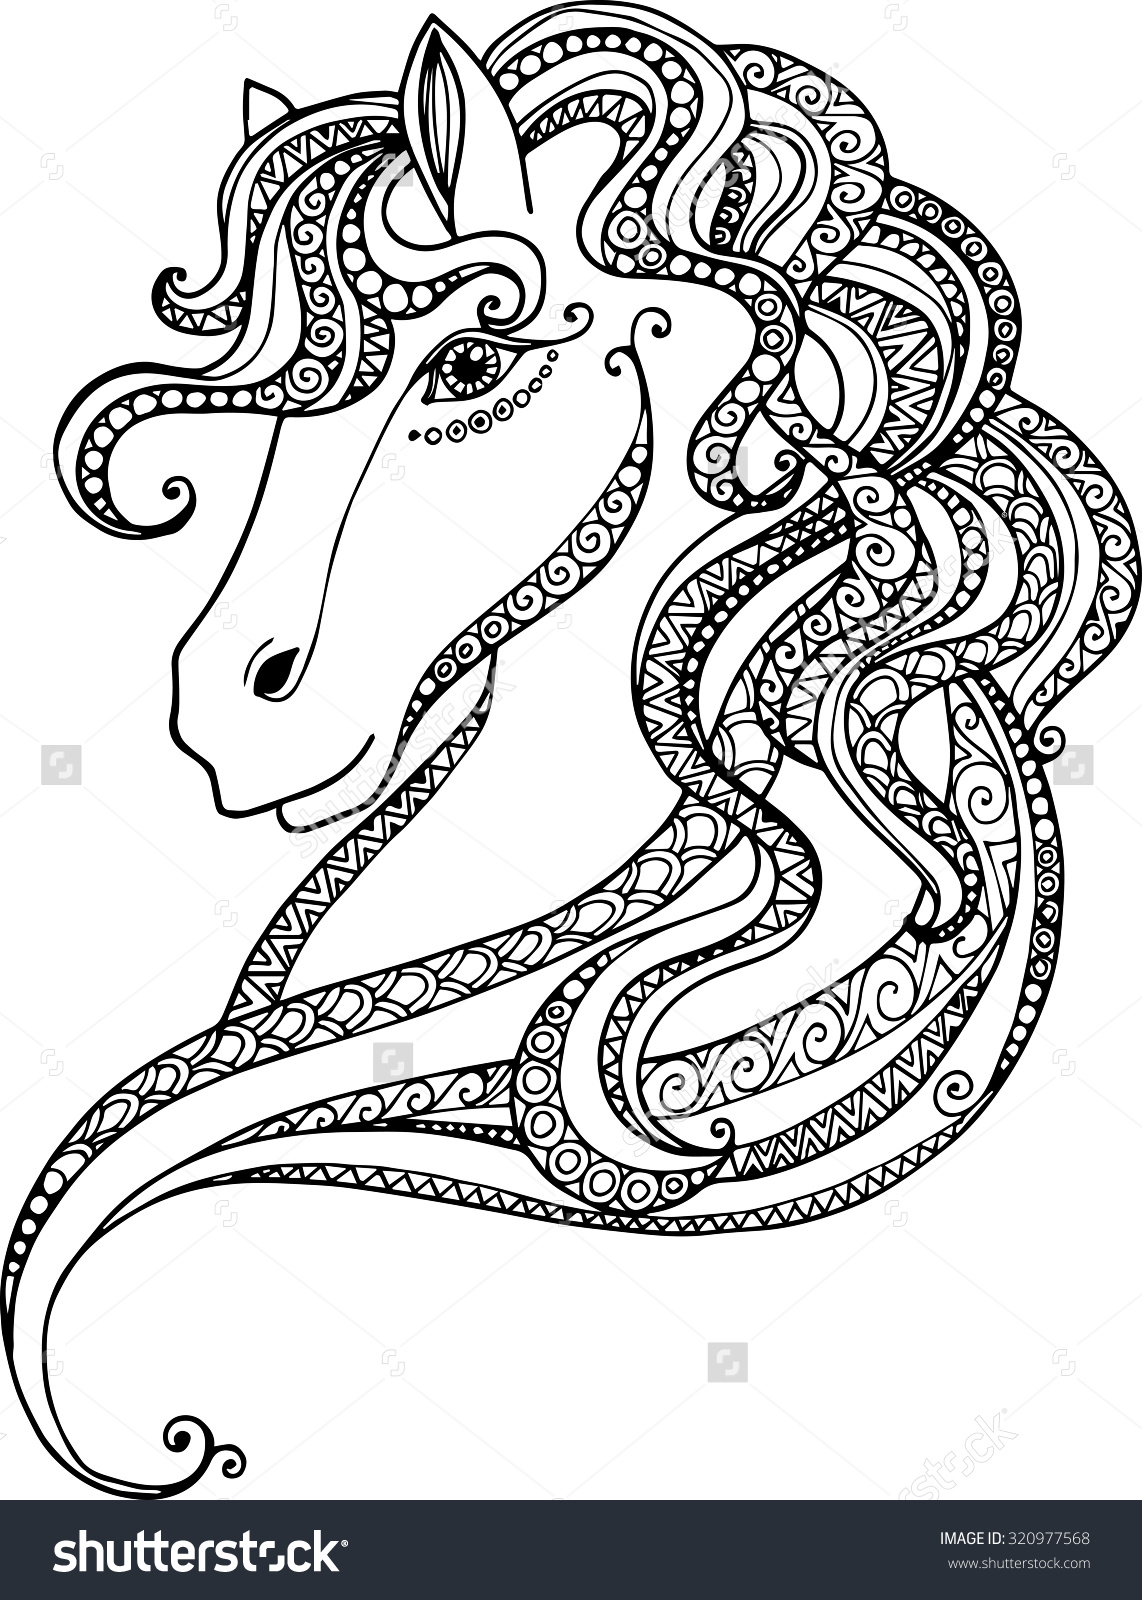 Drawn vans zentangle Hand decorative illustration Horse horse